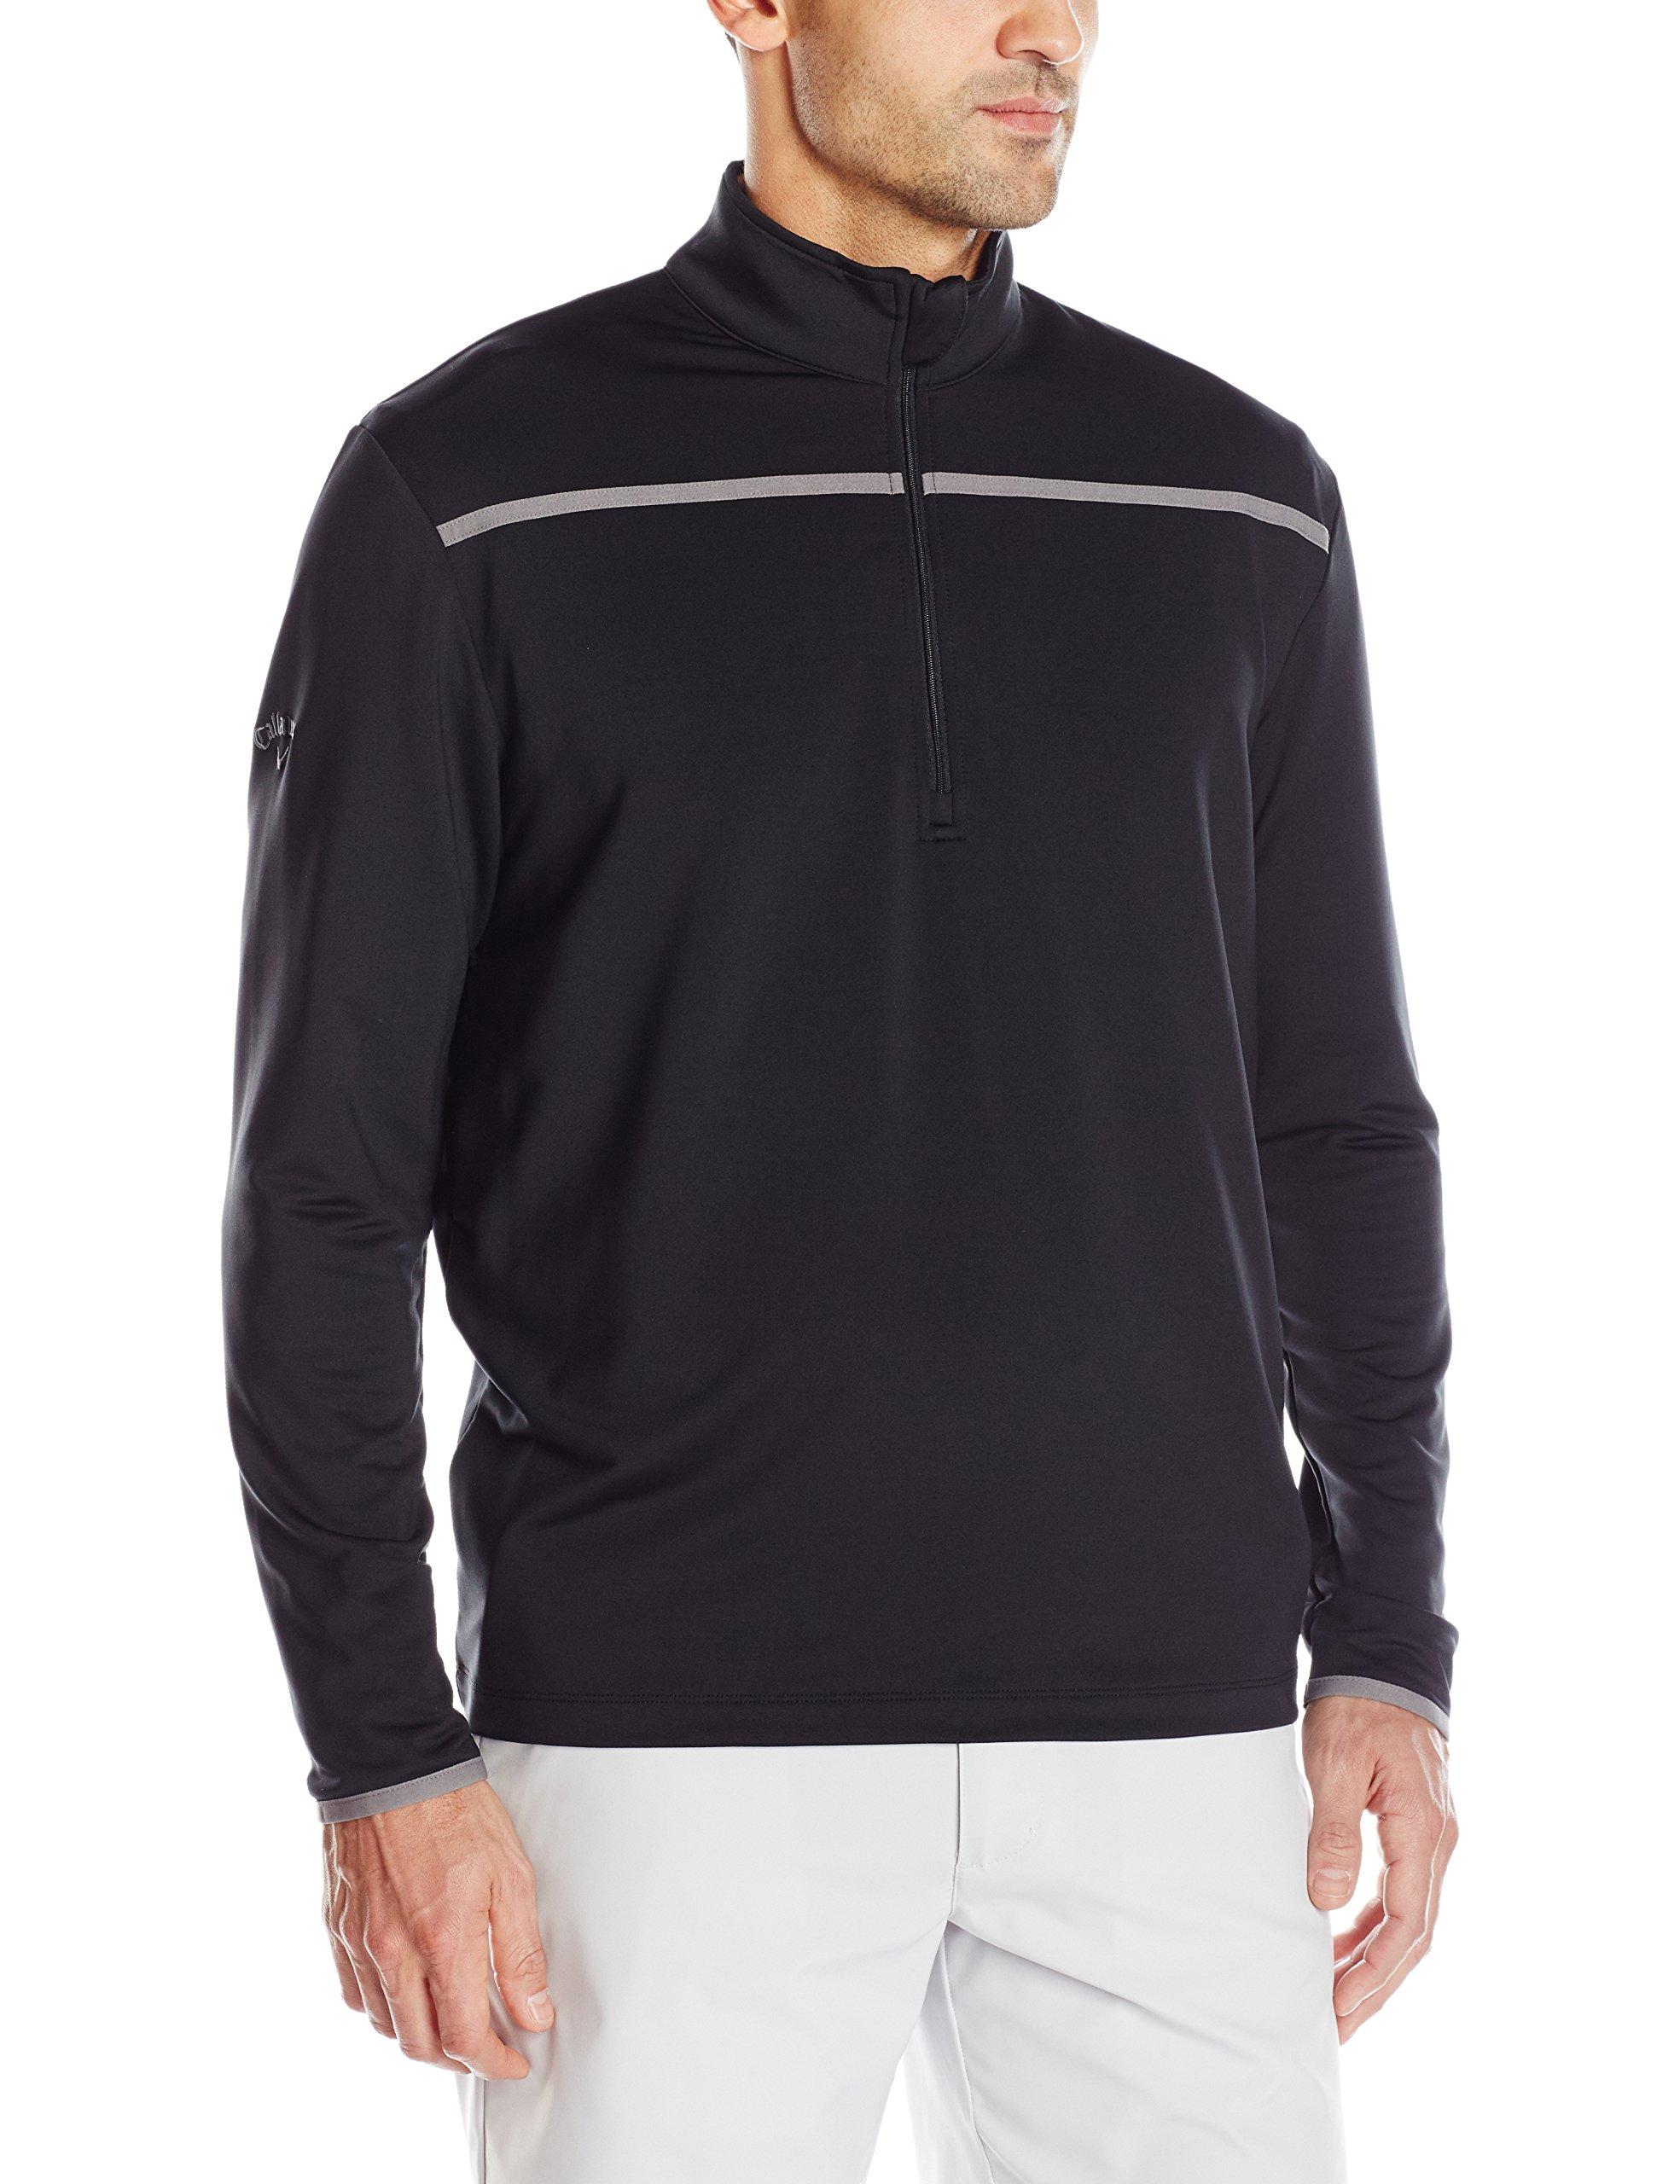 Callaway Men's Golf Chest Stripe Long Sleeve 1/4 Zip Mock Pullover, Black, Large